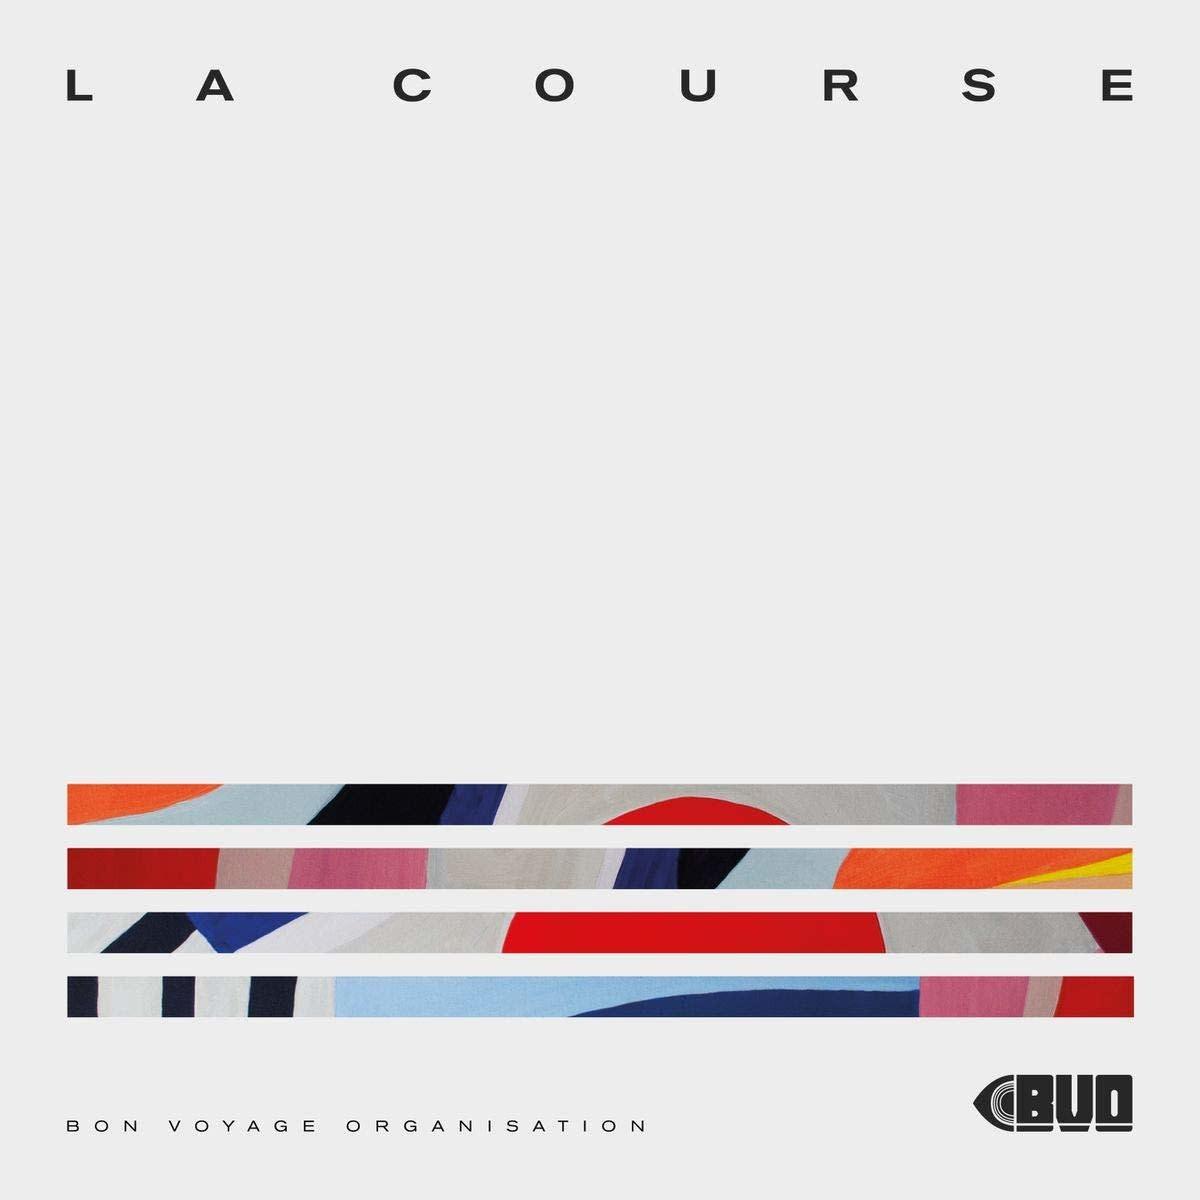 Bon Voyage Organisation • La Course-1